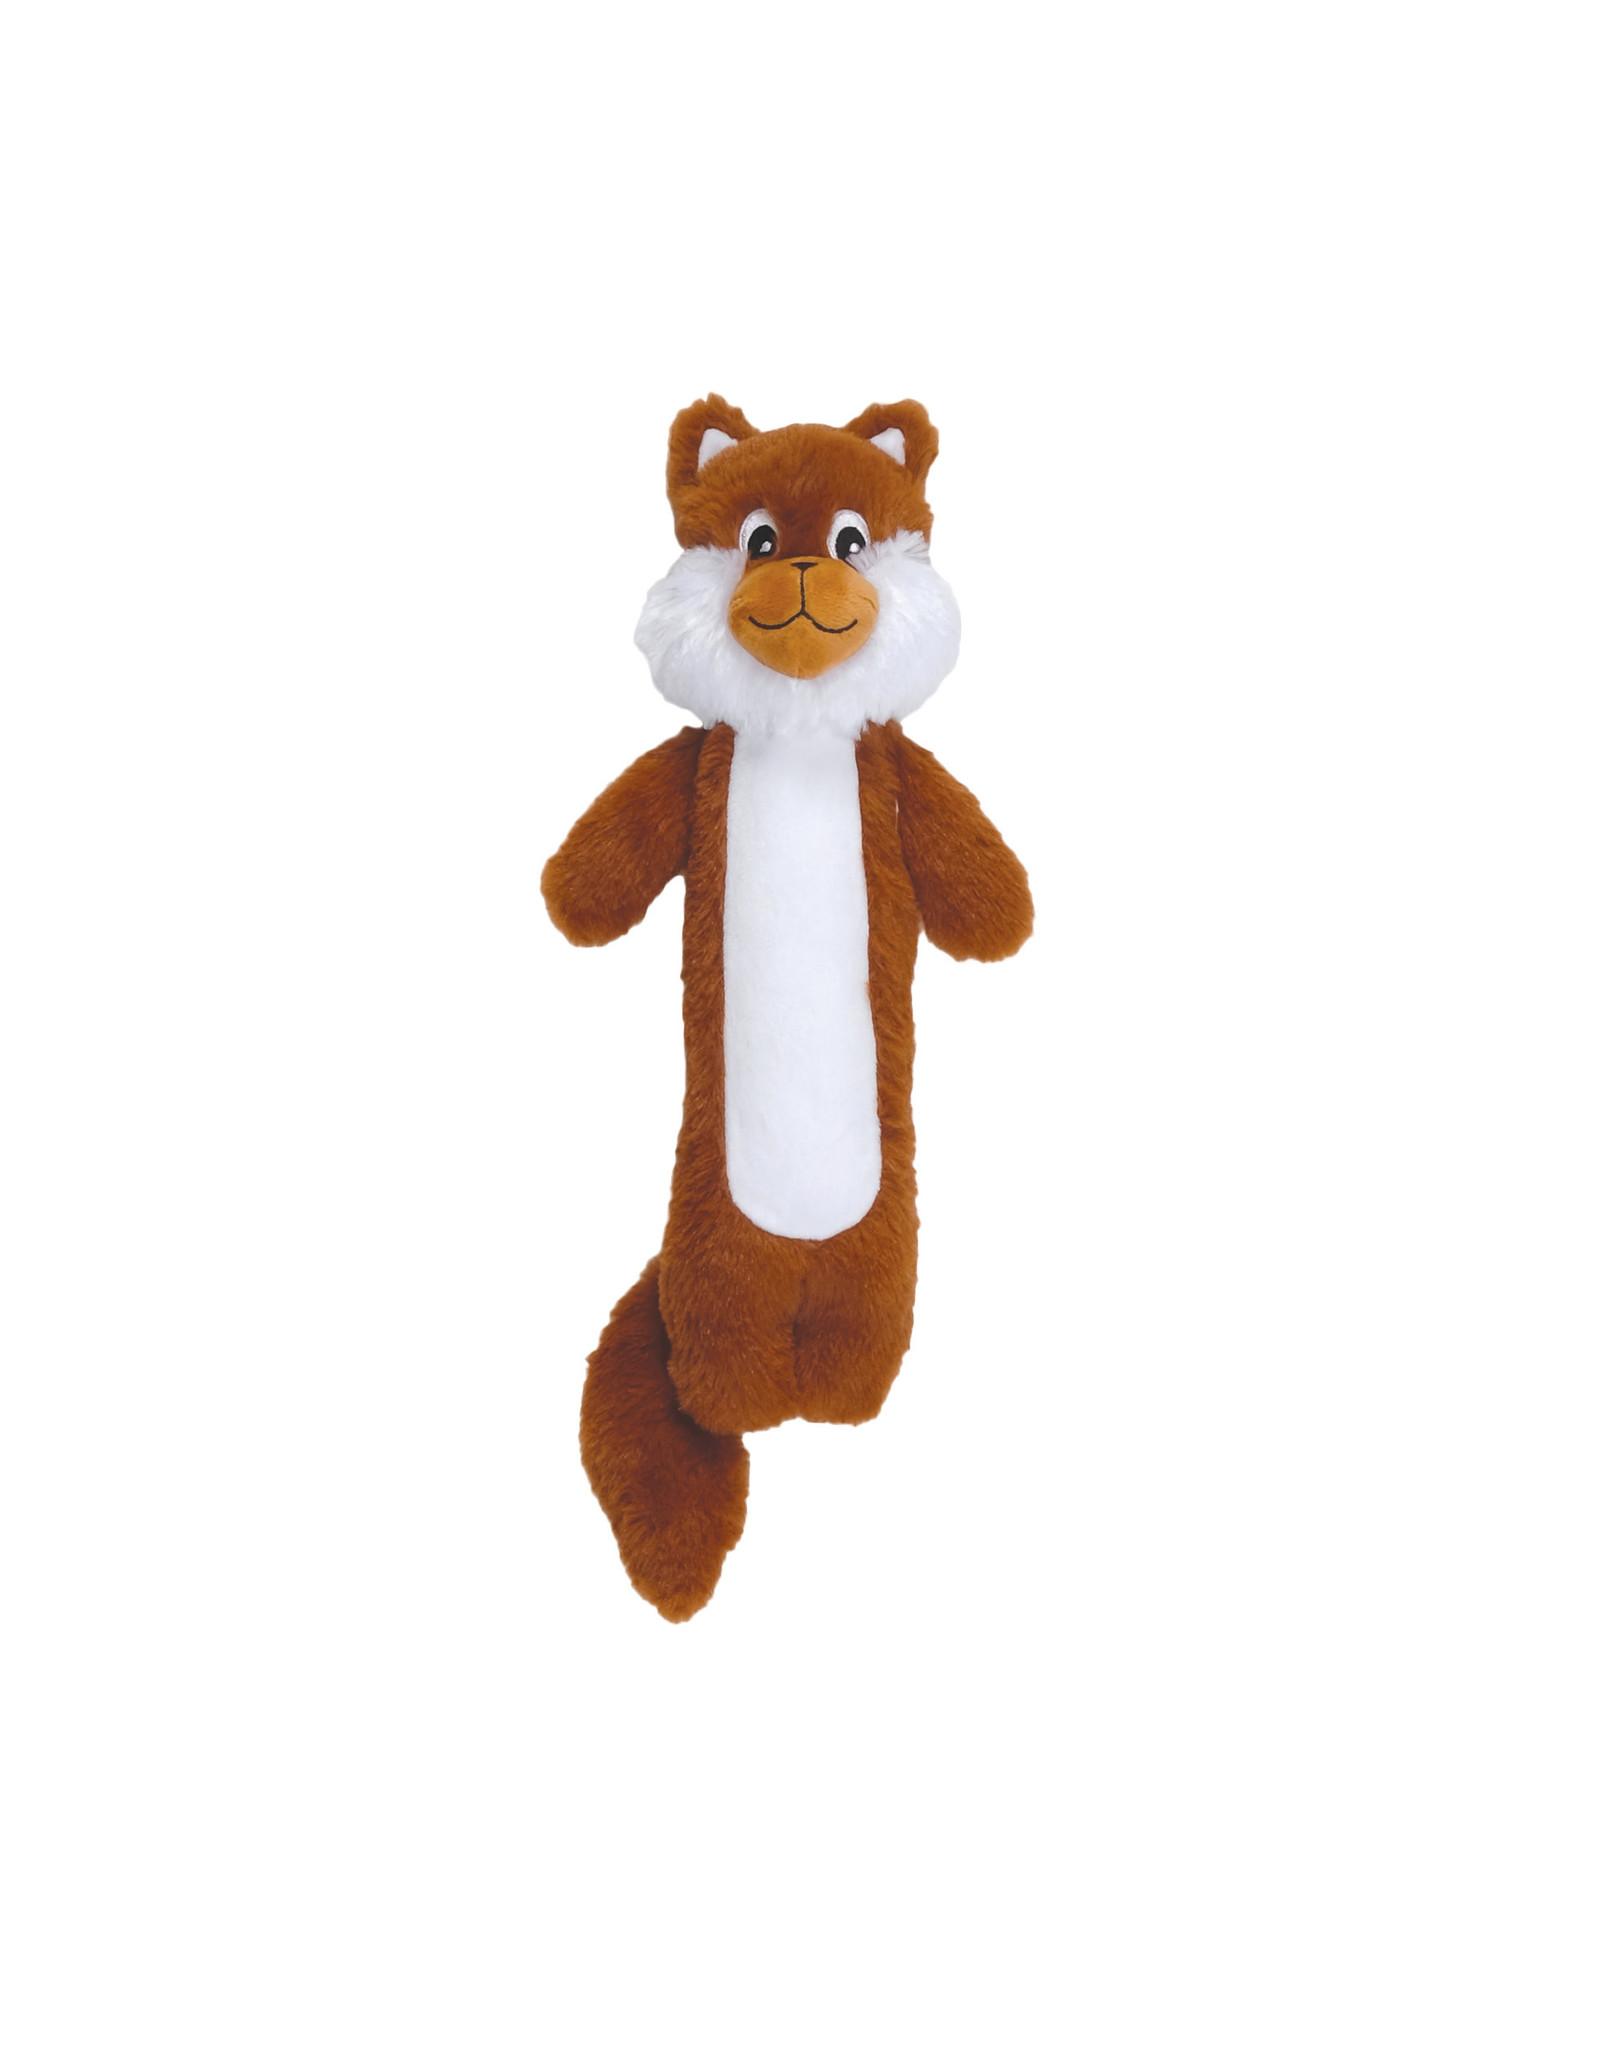 DogIt Dogit Stuffies - Forest Stick Friend - Chipmunk - 39 cm (15.5 in)